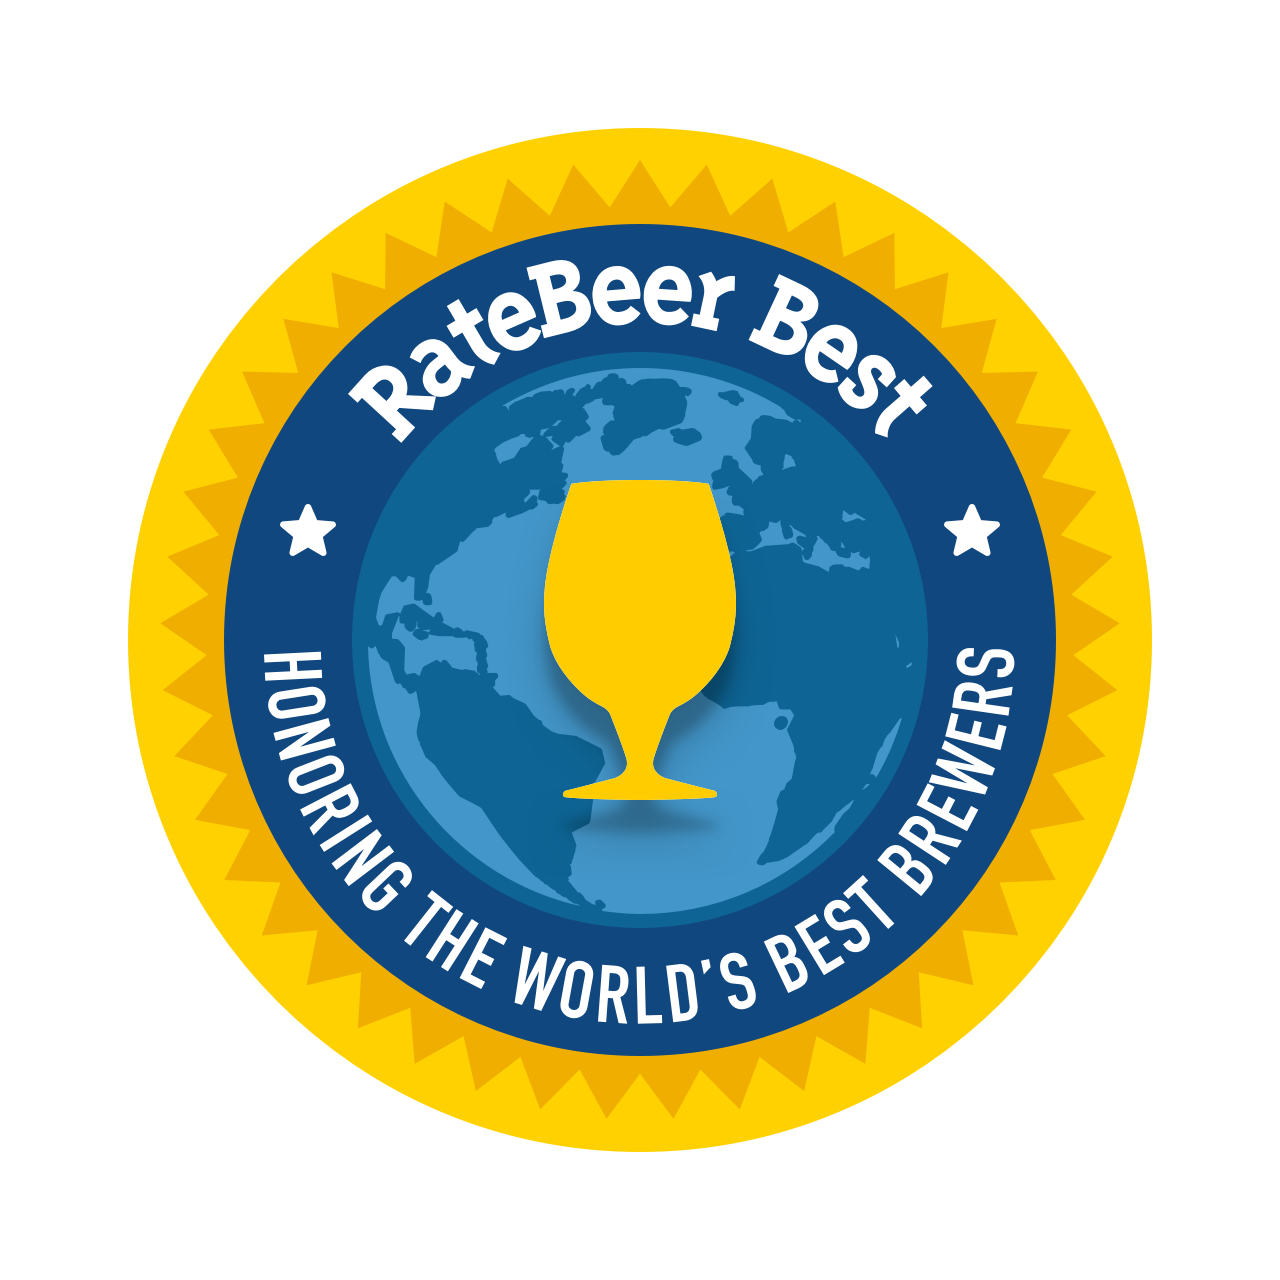 wayfinder-beer-best-new-brewers-in-the-world.png